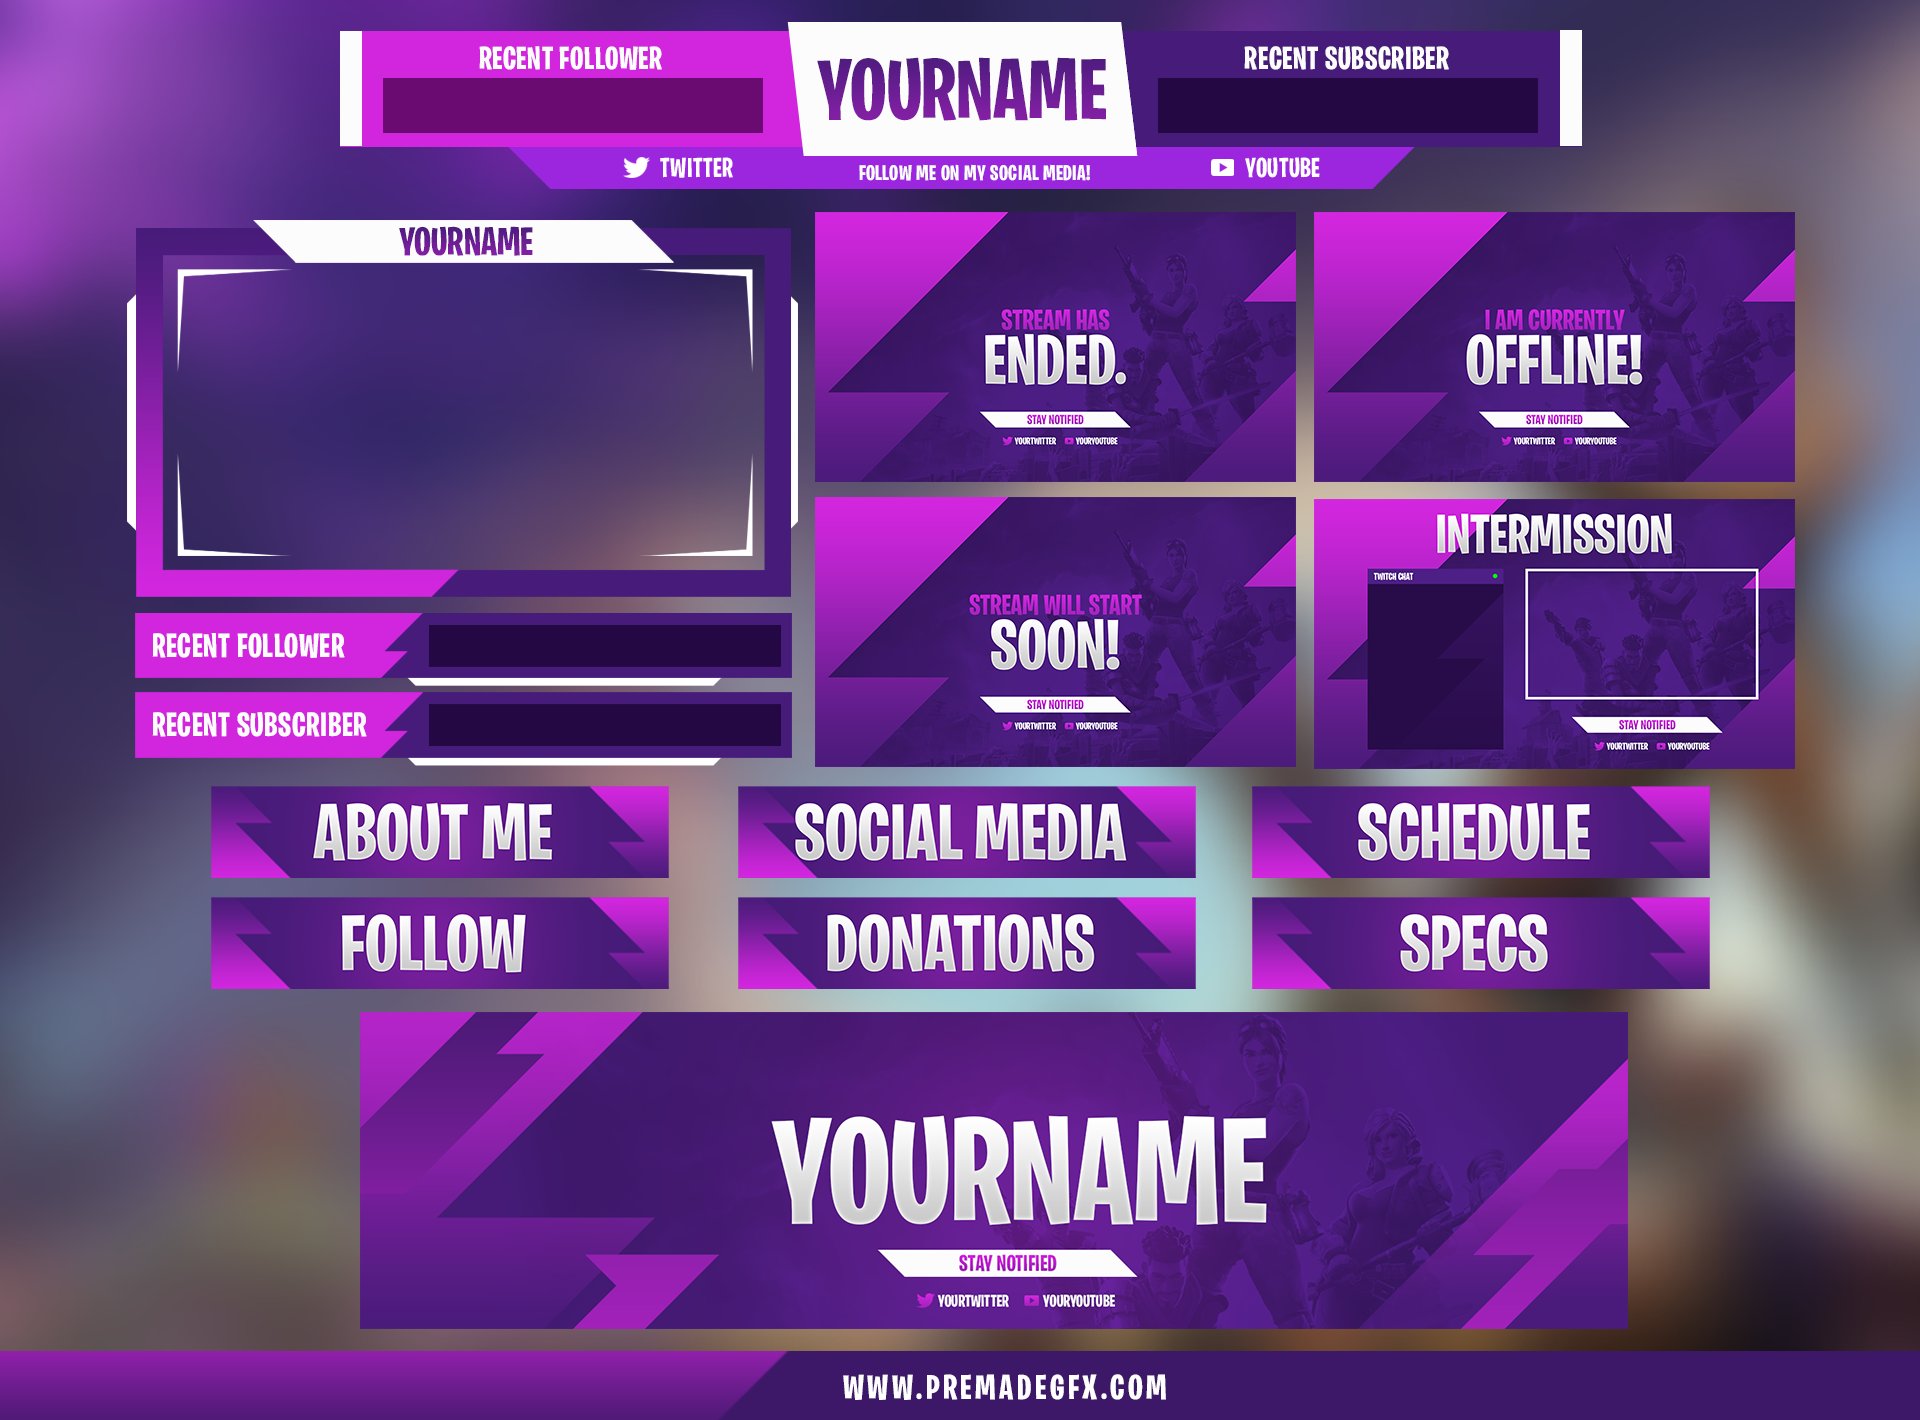 fortnite twitch pack premadegfx banners | Wiplocker Gamer